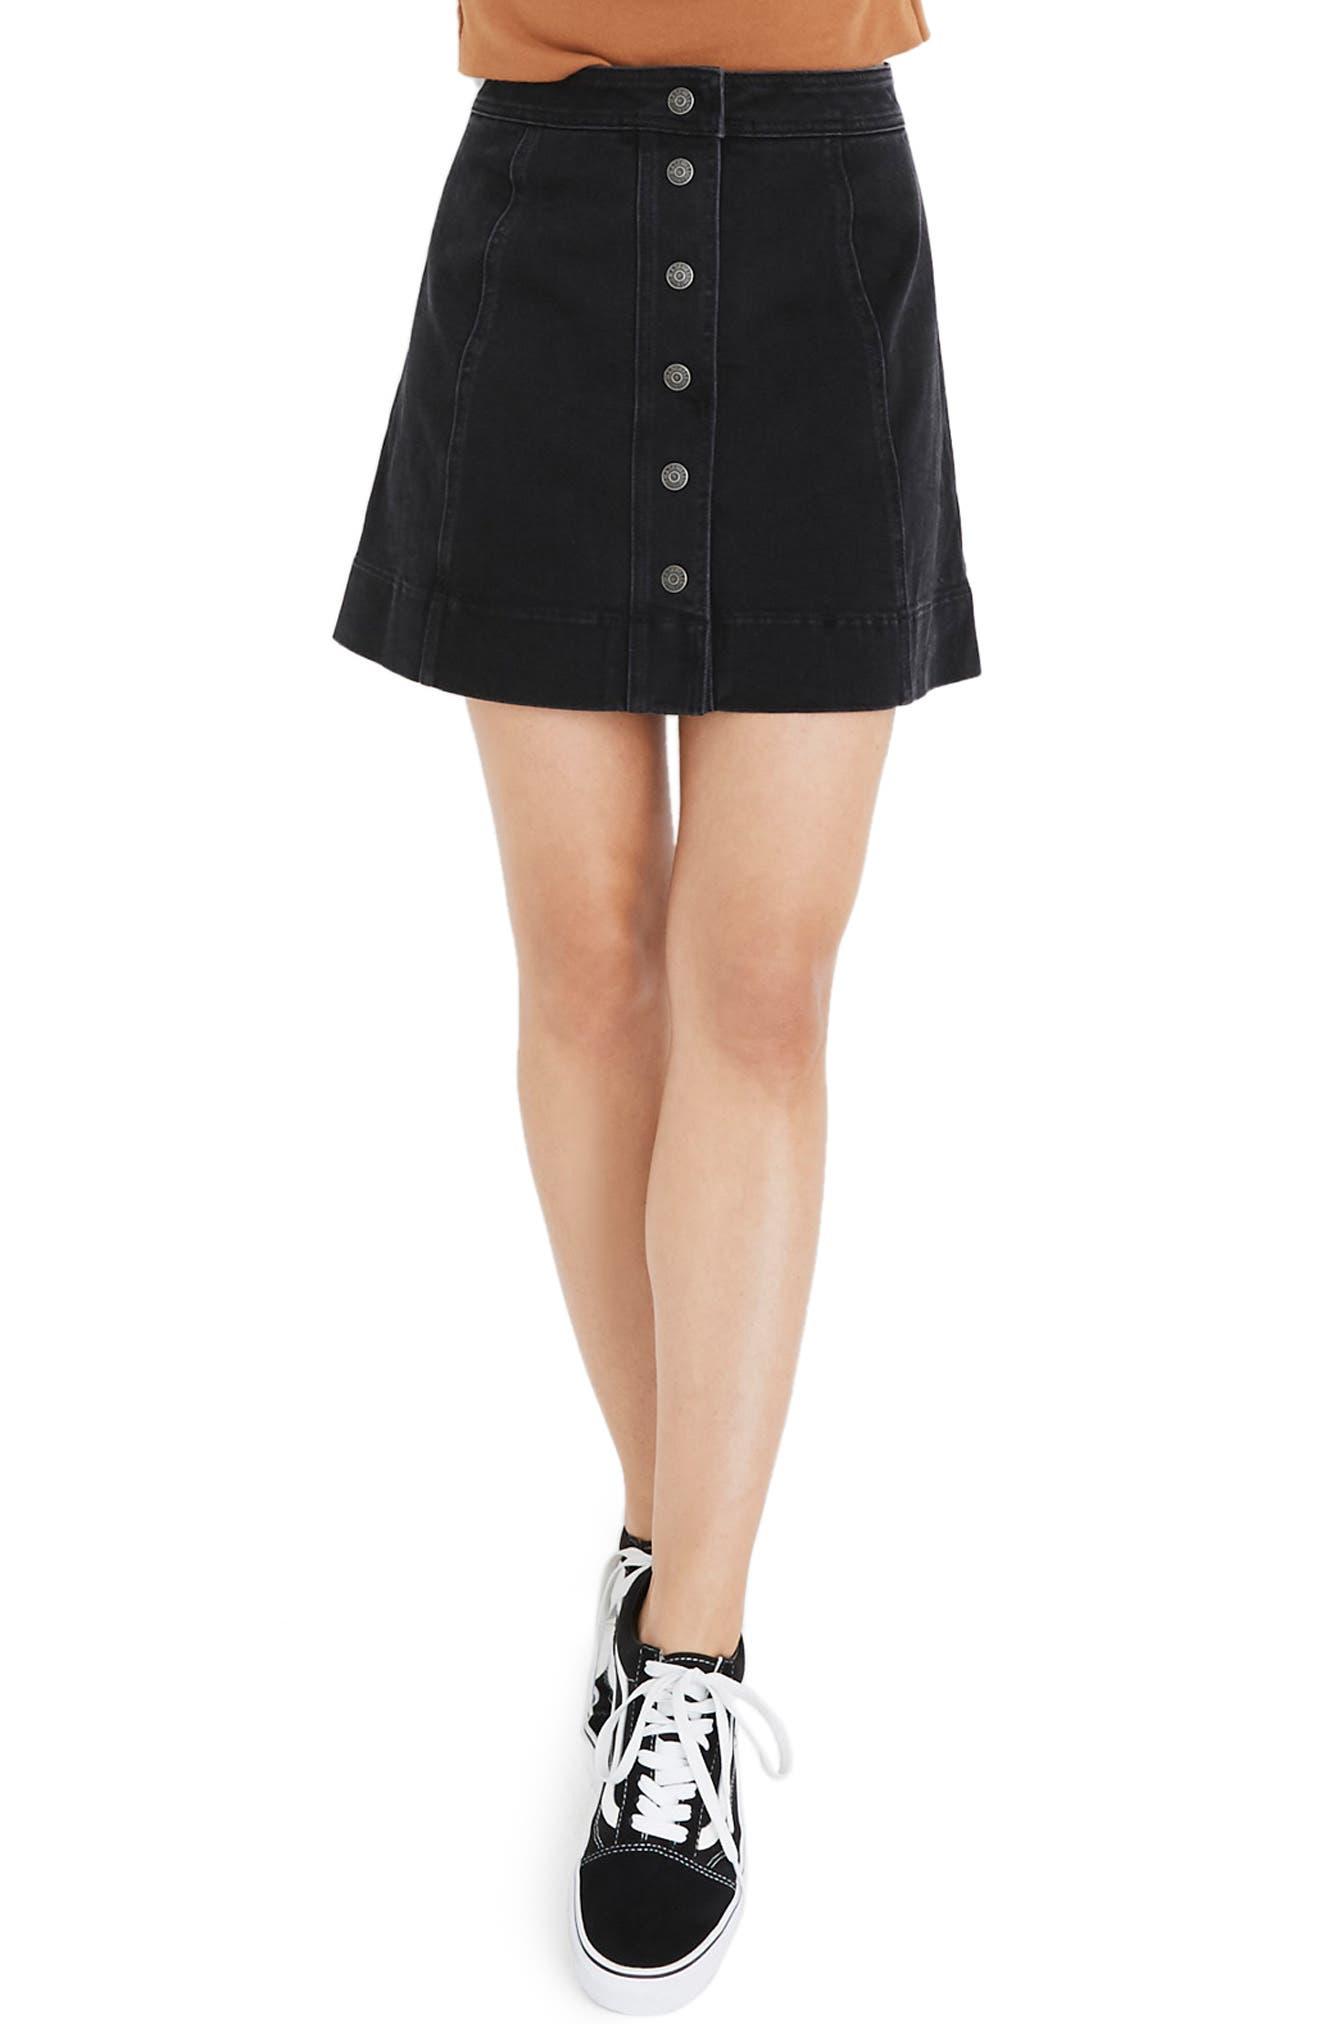 Madewell Metropolis Snap Front Denim Miniskirt, Black